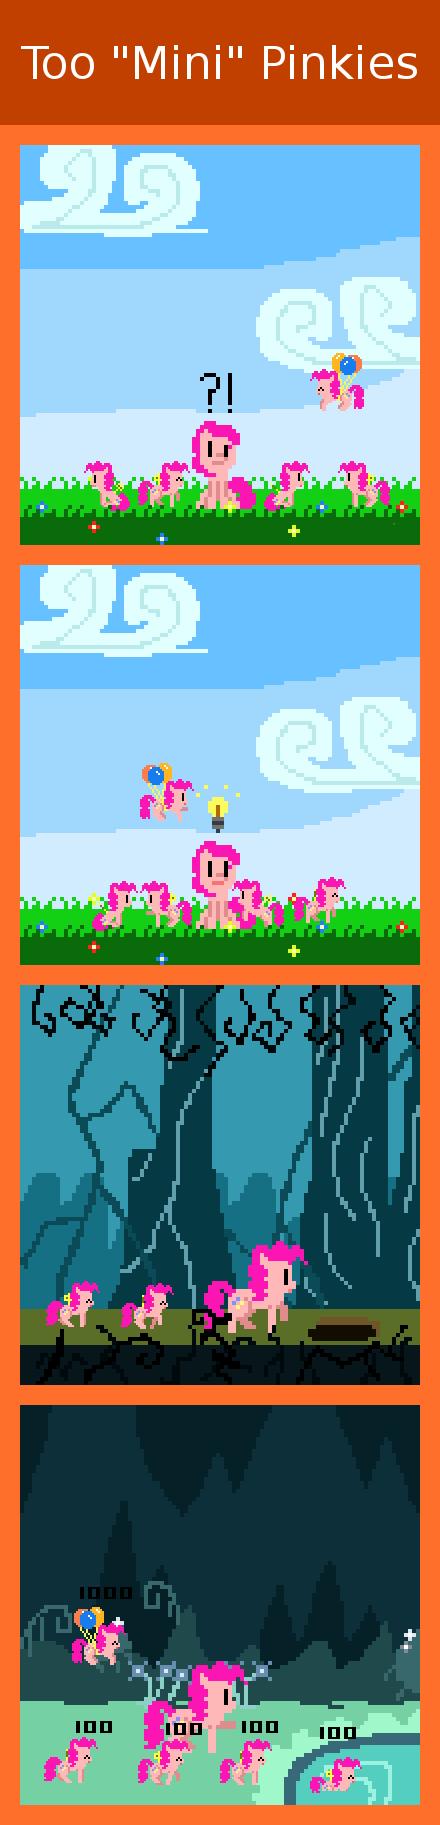 "Too ""Mini"" Pinkies. via zztfox.deviantart.com/#/d5o2g7yfun Pinkie disposes of her Mini clones the Mario vs Donkey Kong way! MLP FiM and Pinkie Pie copyright Fau"